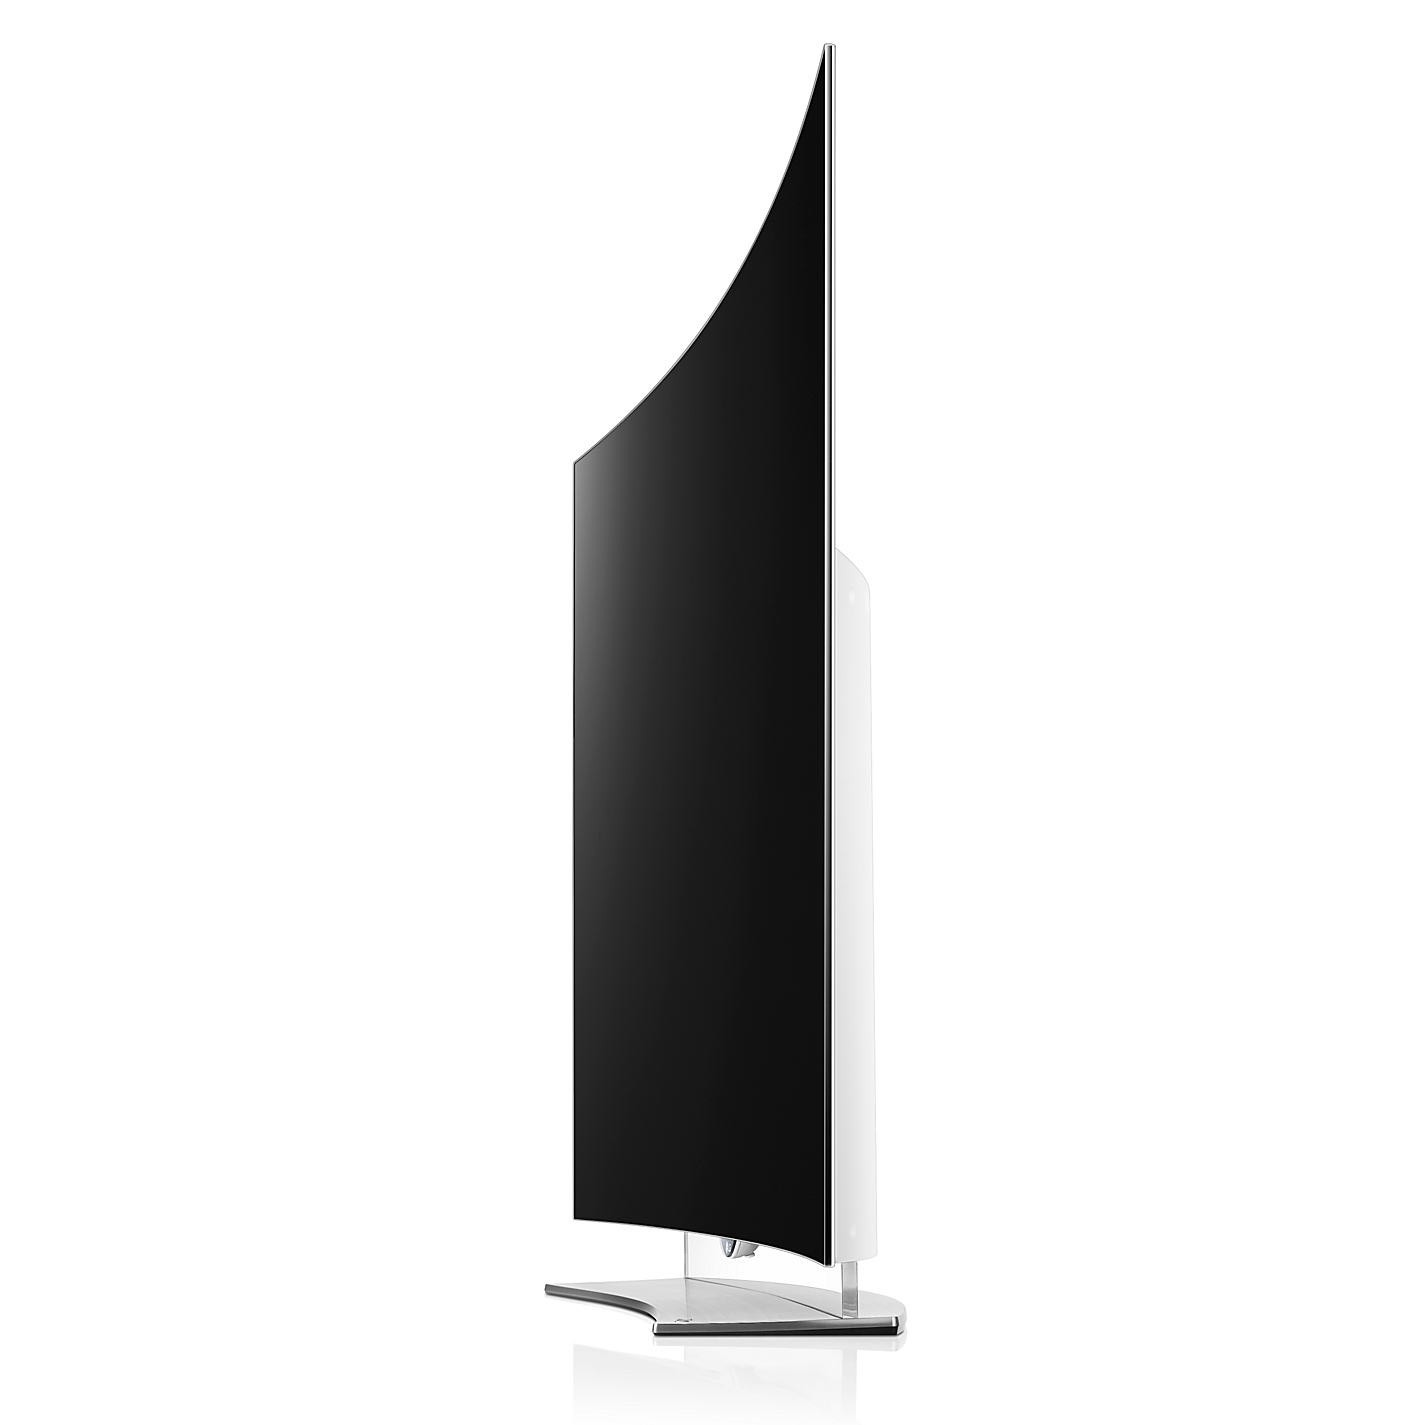 tv oled lg continue de baisser les prix. Black Bedroom Furniture Sets. Home Design Ideas